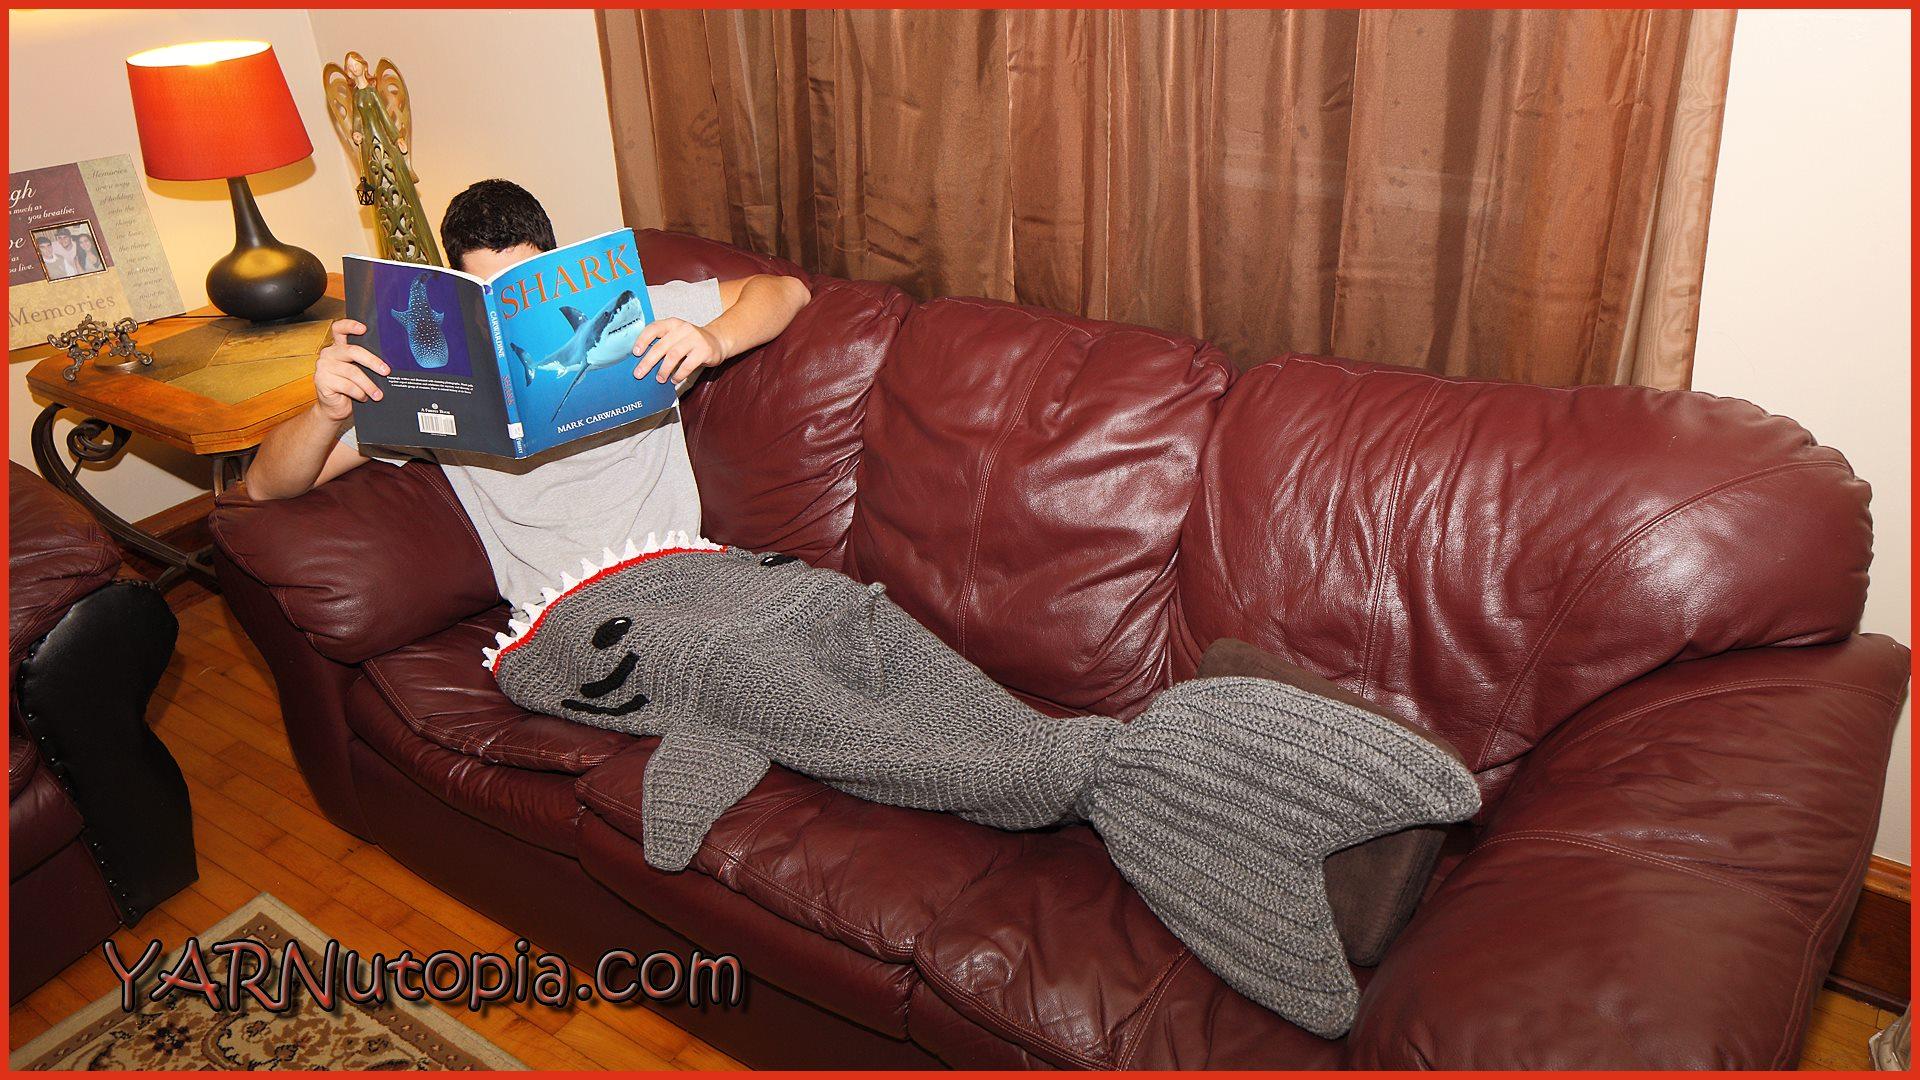 Crochet Tutorial Adult Shark Blanket Yarnutopia By Nadia Fuad